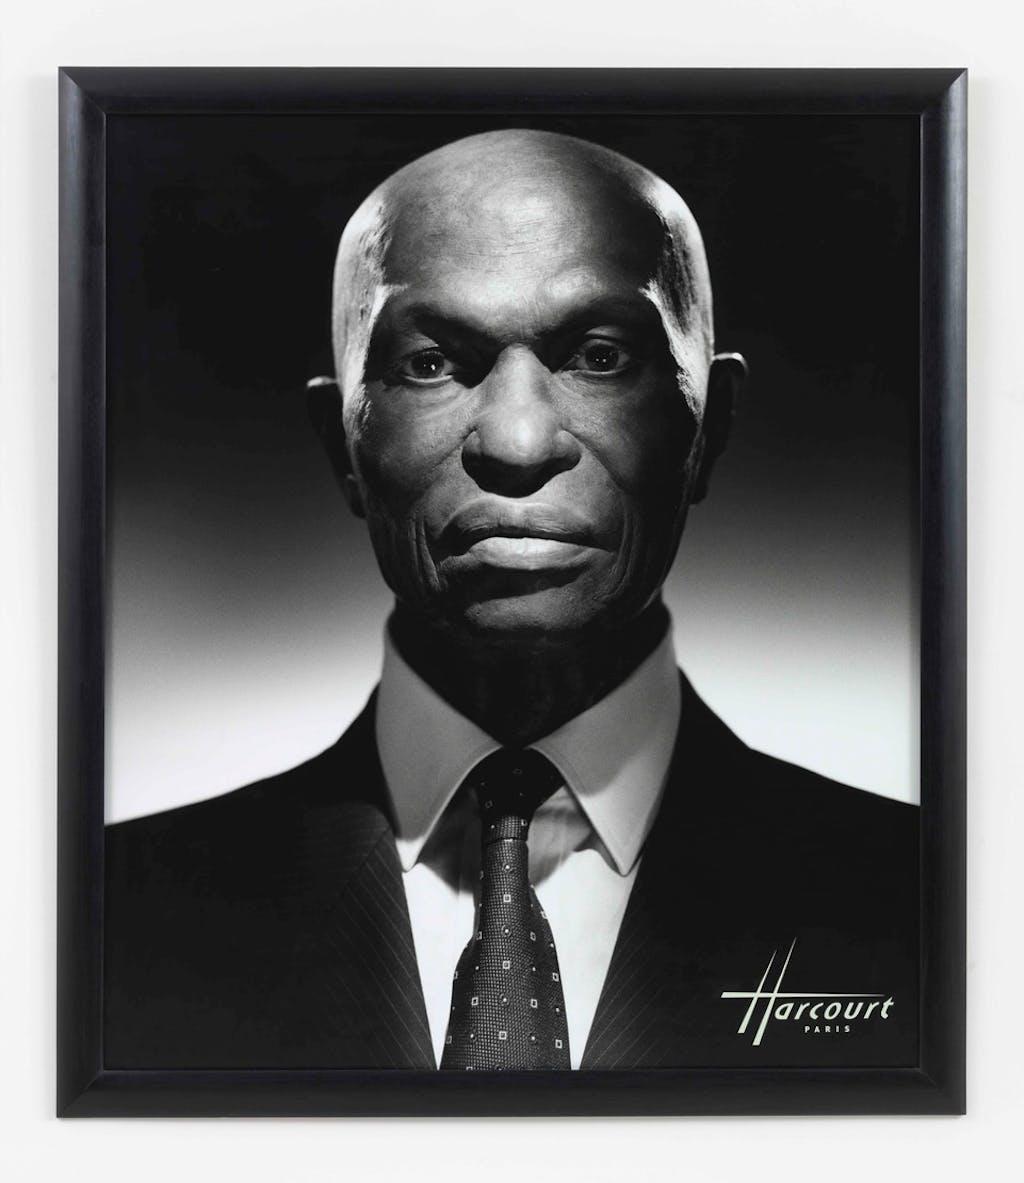 Harcourt/Grévin n°3 [Président Wade] - © kamel mennour